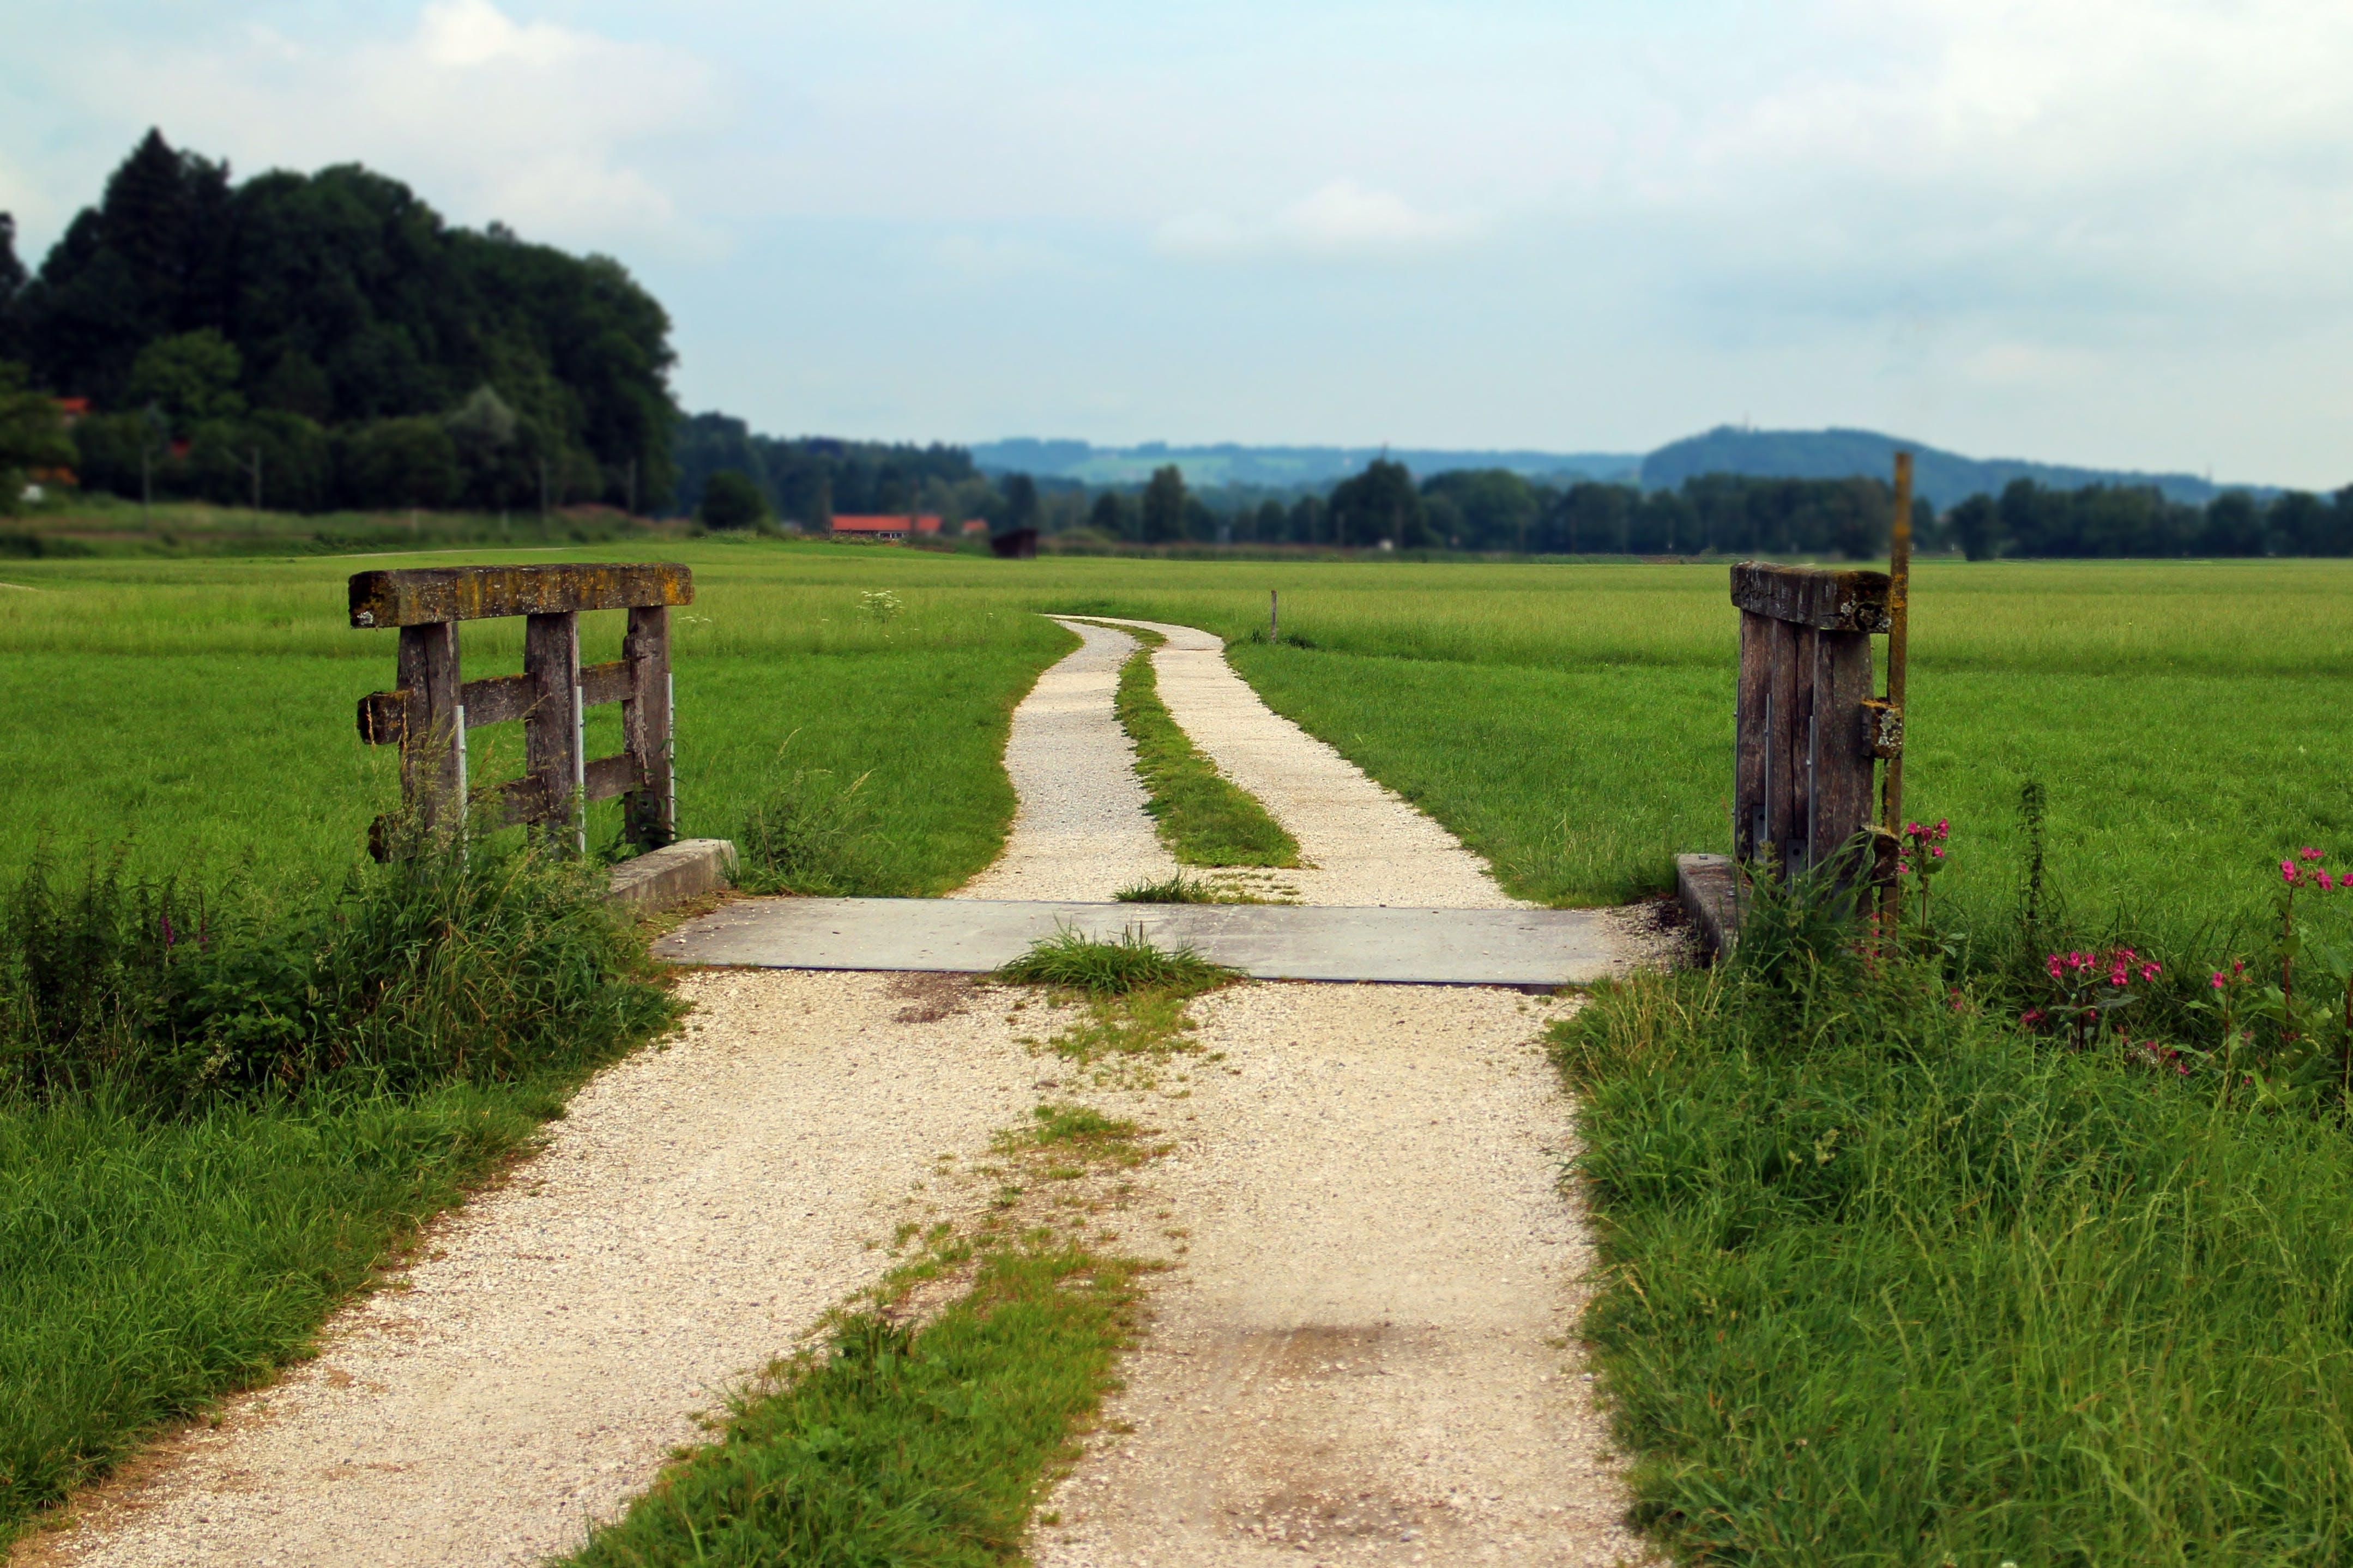 agriculture, barn, boardwalk